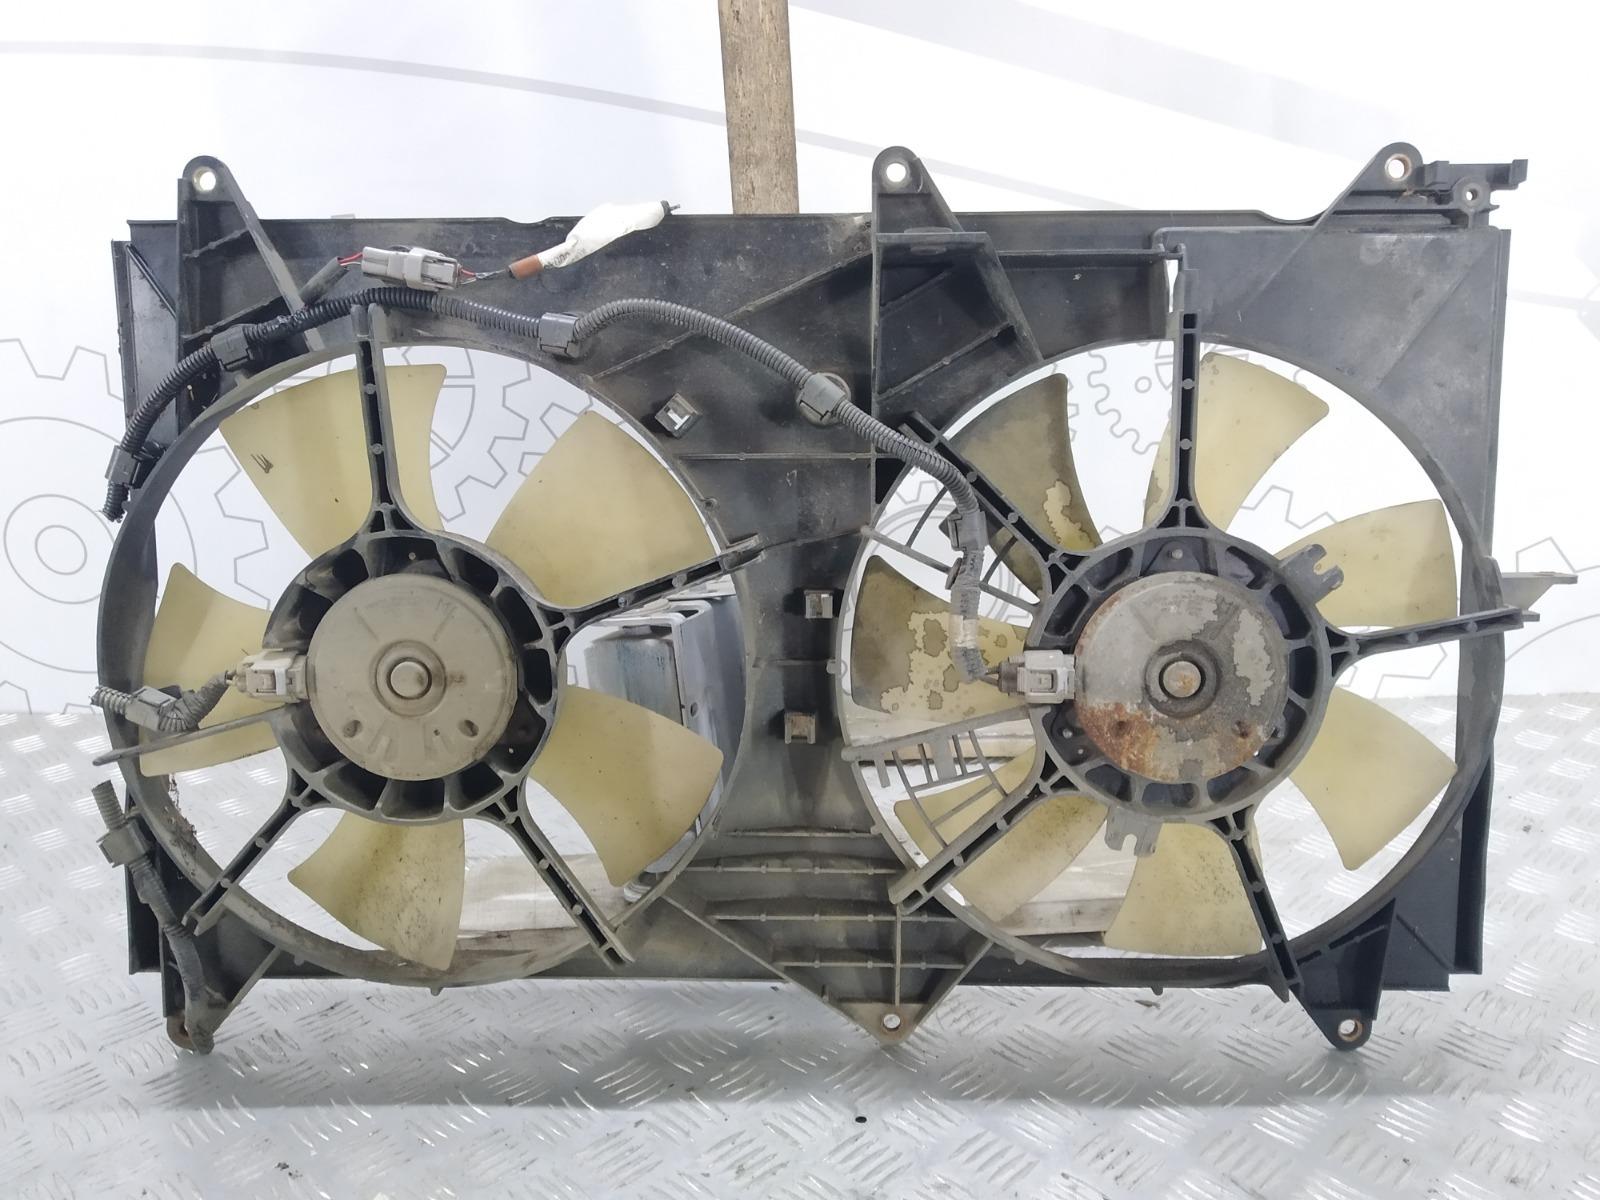 Вентилятор радиатора Toyota Avensis Verso 2.0 D-4D 2002 (б/у)